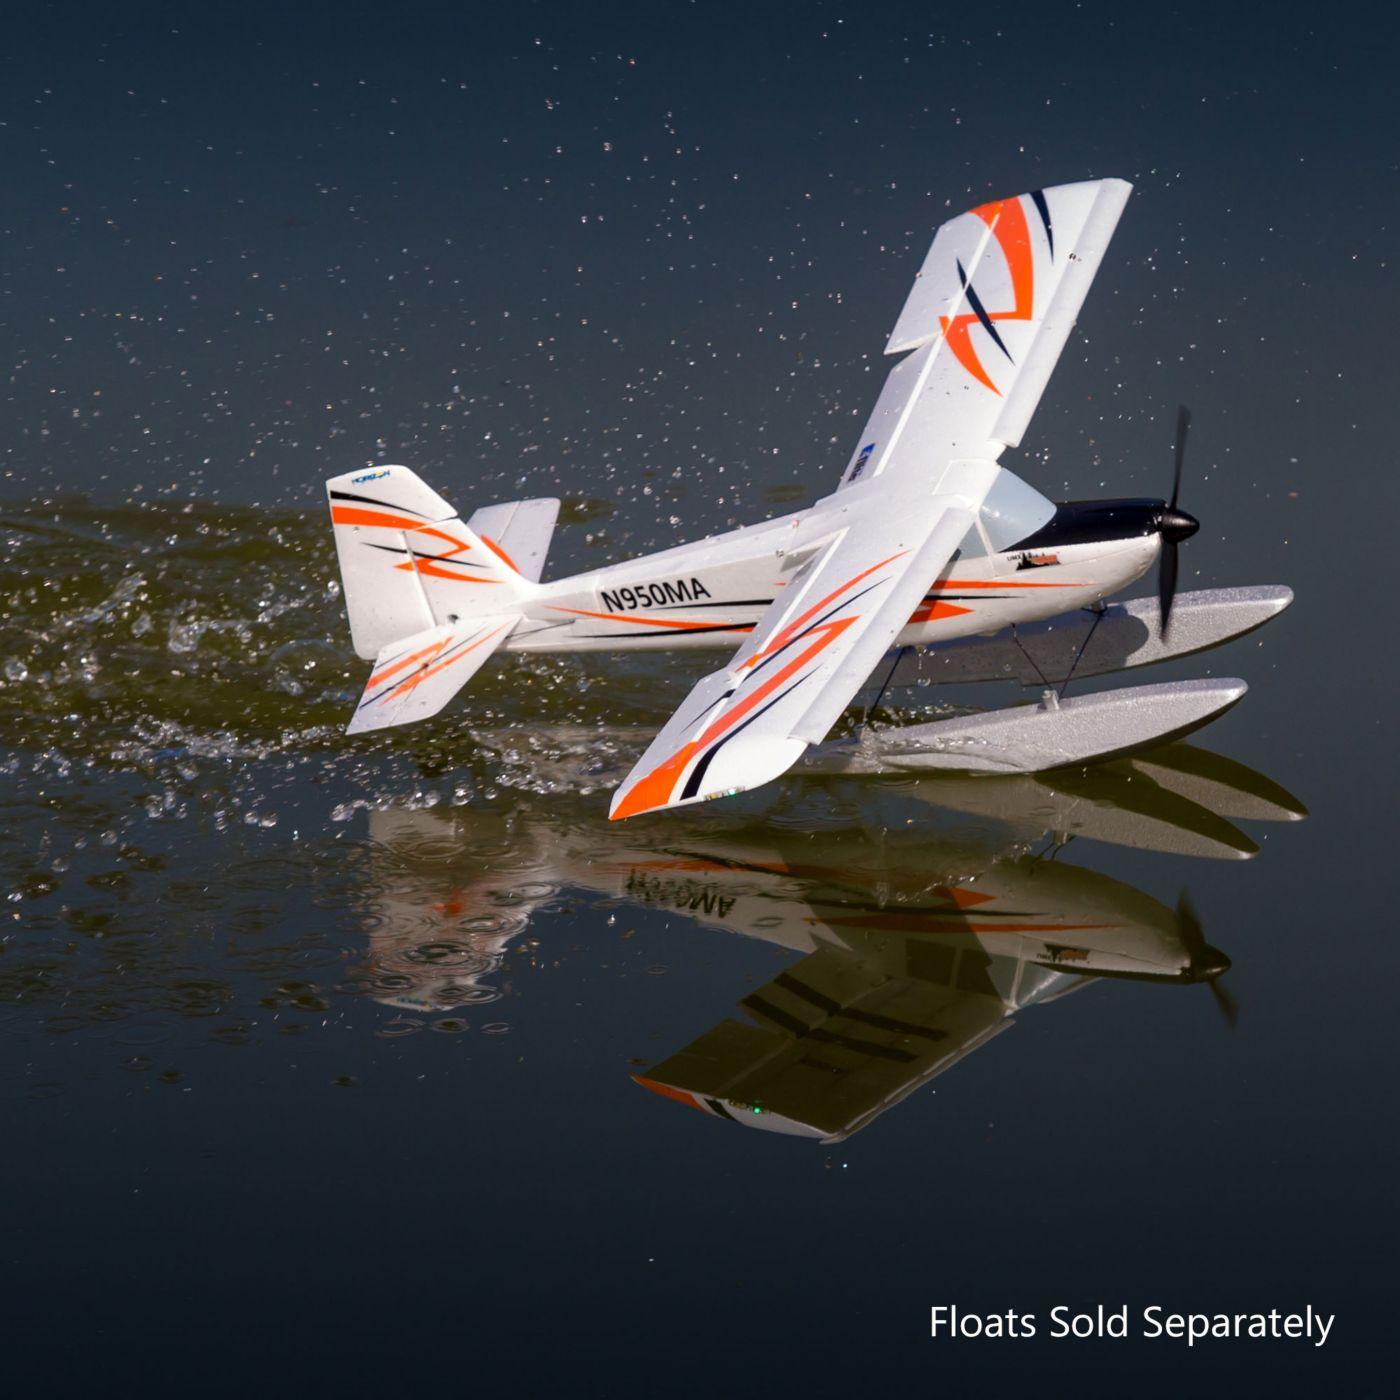 E-flite UMX Timber BNF Basic Ultra Micro Sport RC Airplane